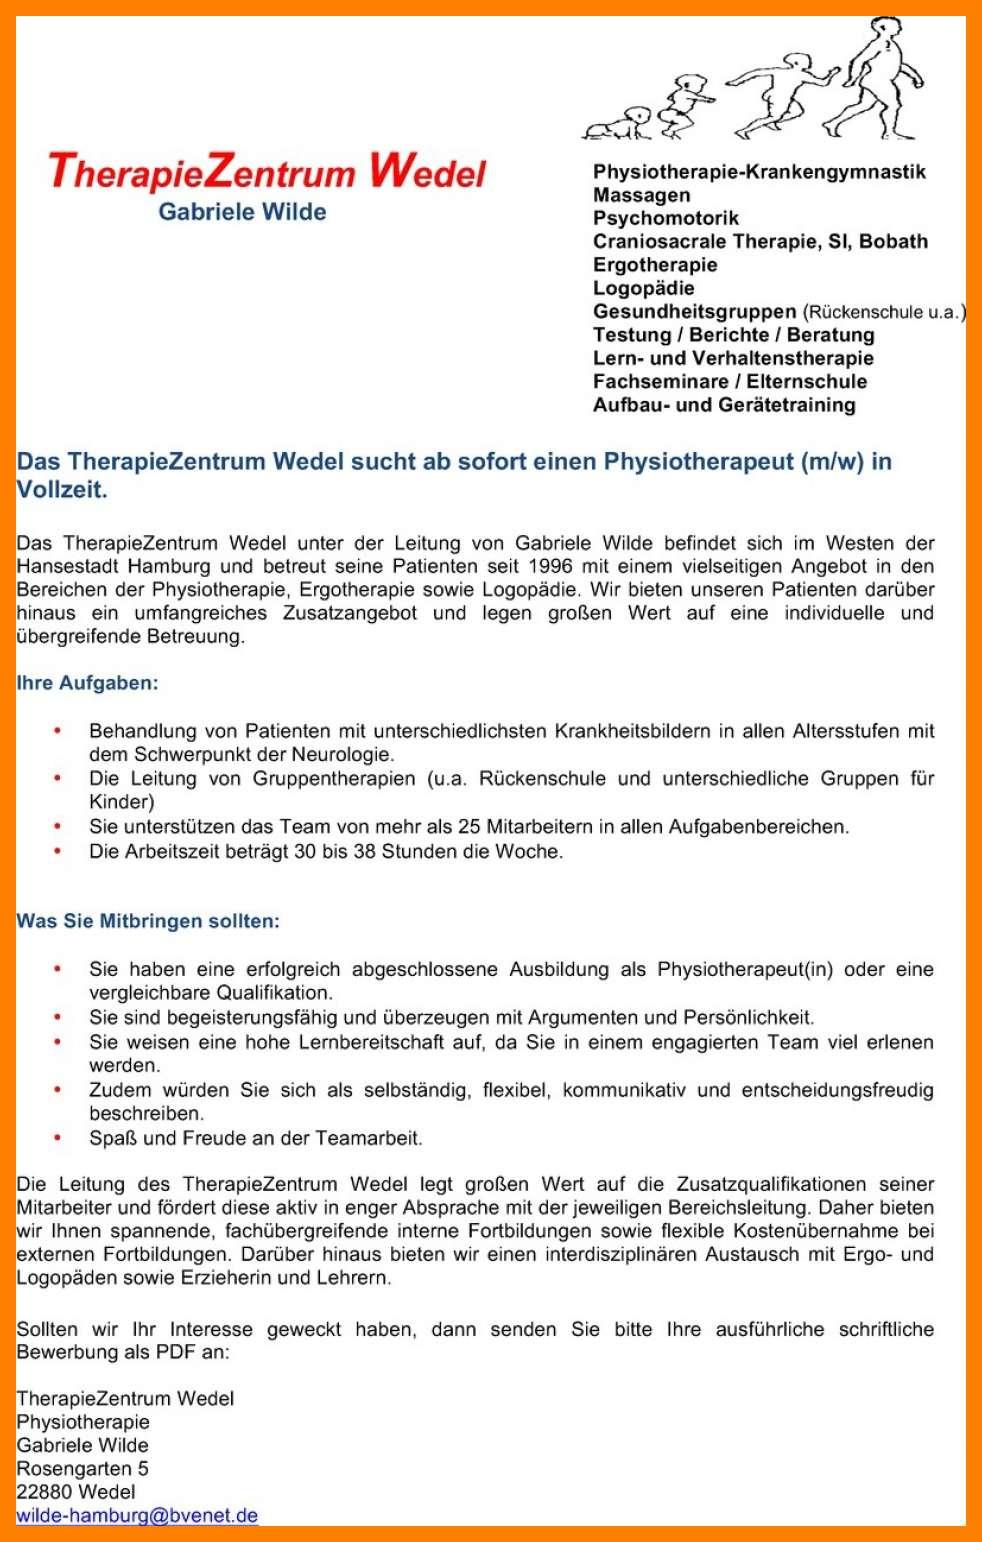 bewerbungsschreiben physiotherapie ausgezeichnet bewerbungsanschreiben physiotherapie berufsanfc3a4nger 58